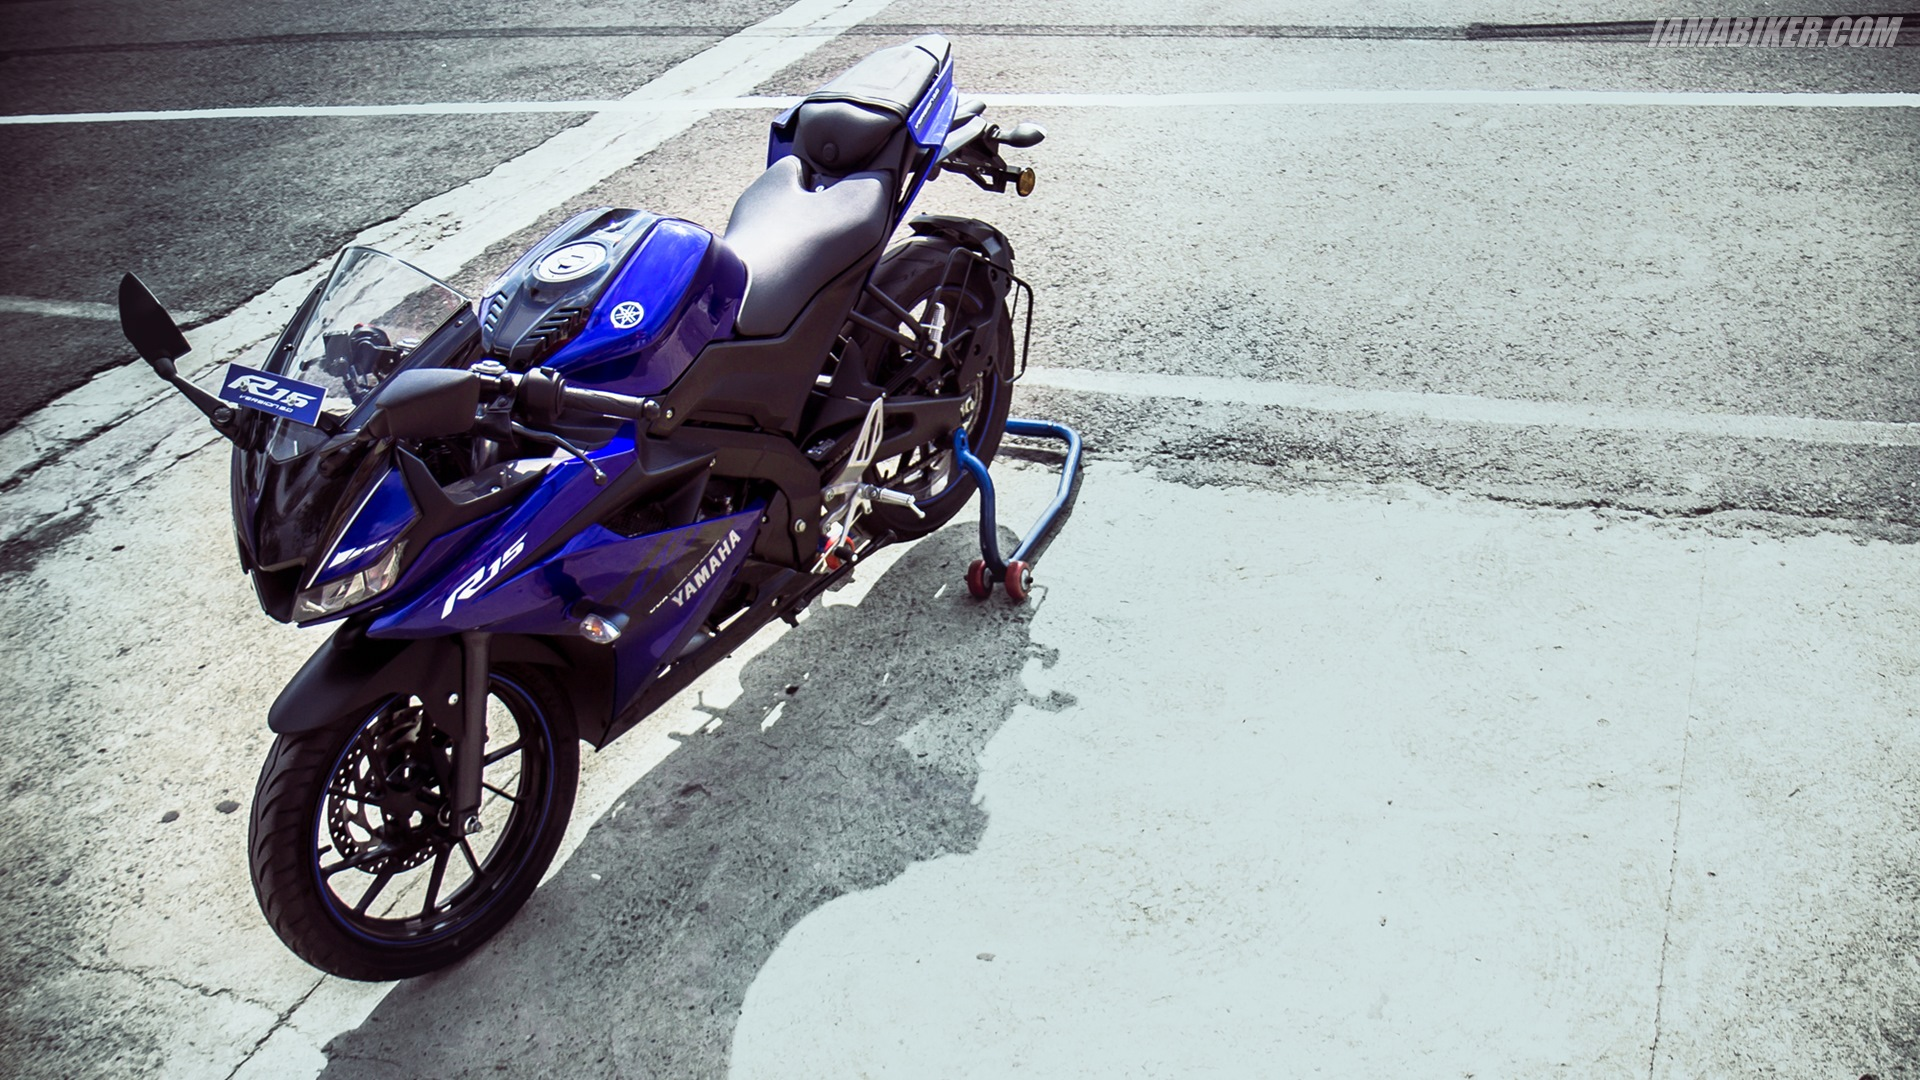 Yamaha R15 V3 Hd Wallpapers Iamabiker Everything Motorcycle